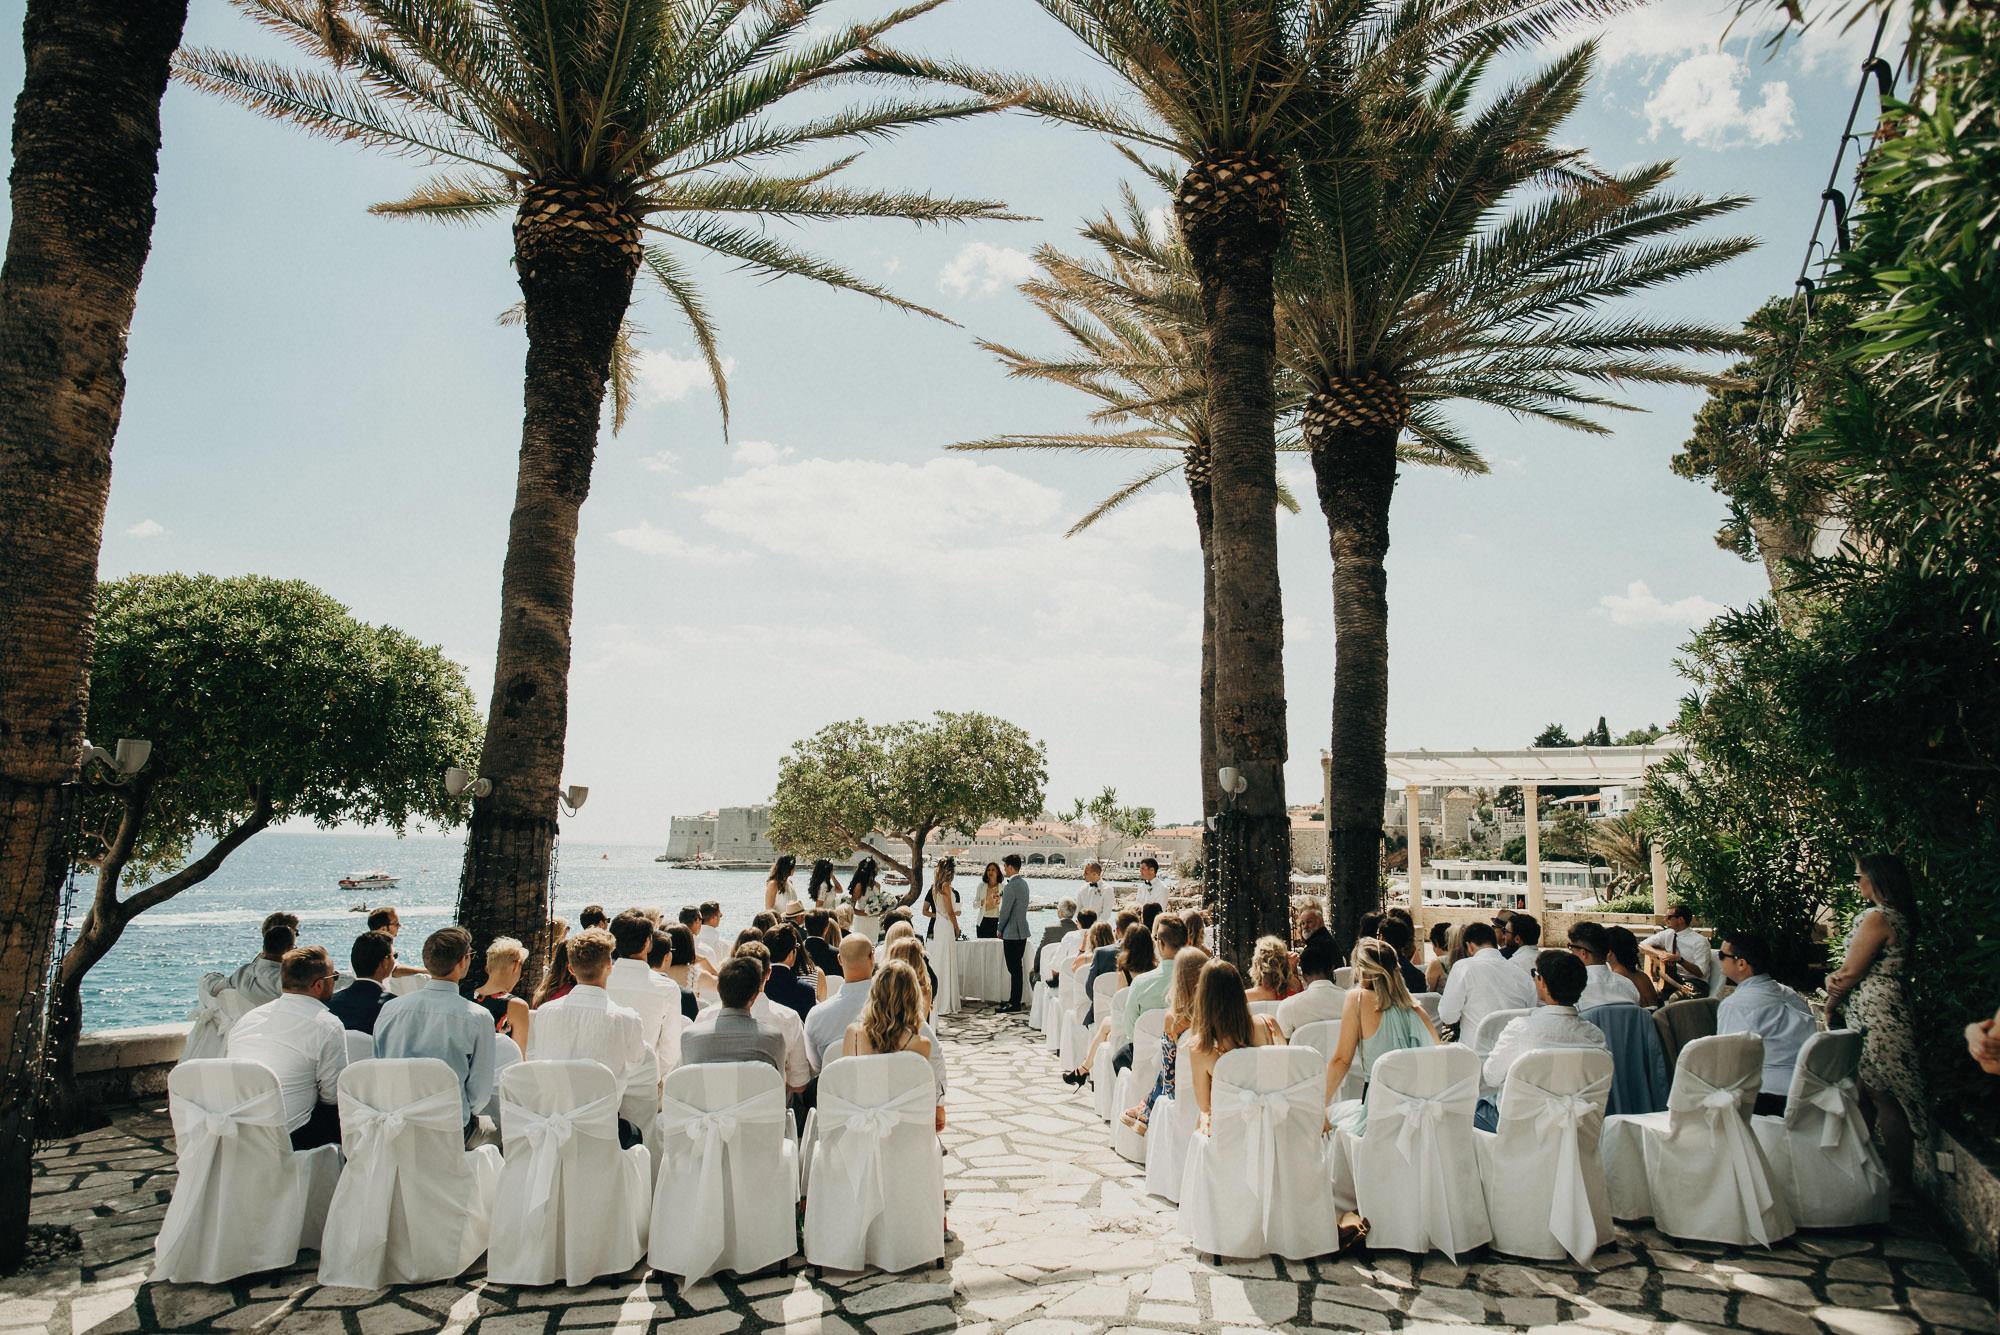 dubrovnik_croatia_wedding_photographer-jere_satamo-destination_weddings-041-web.jpg